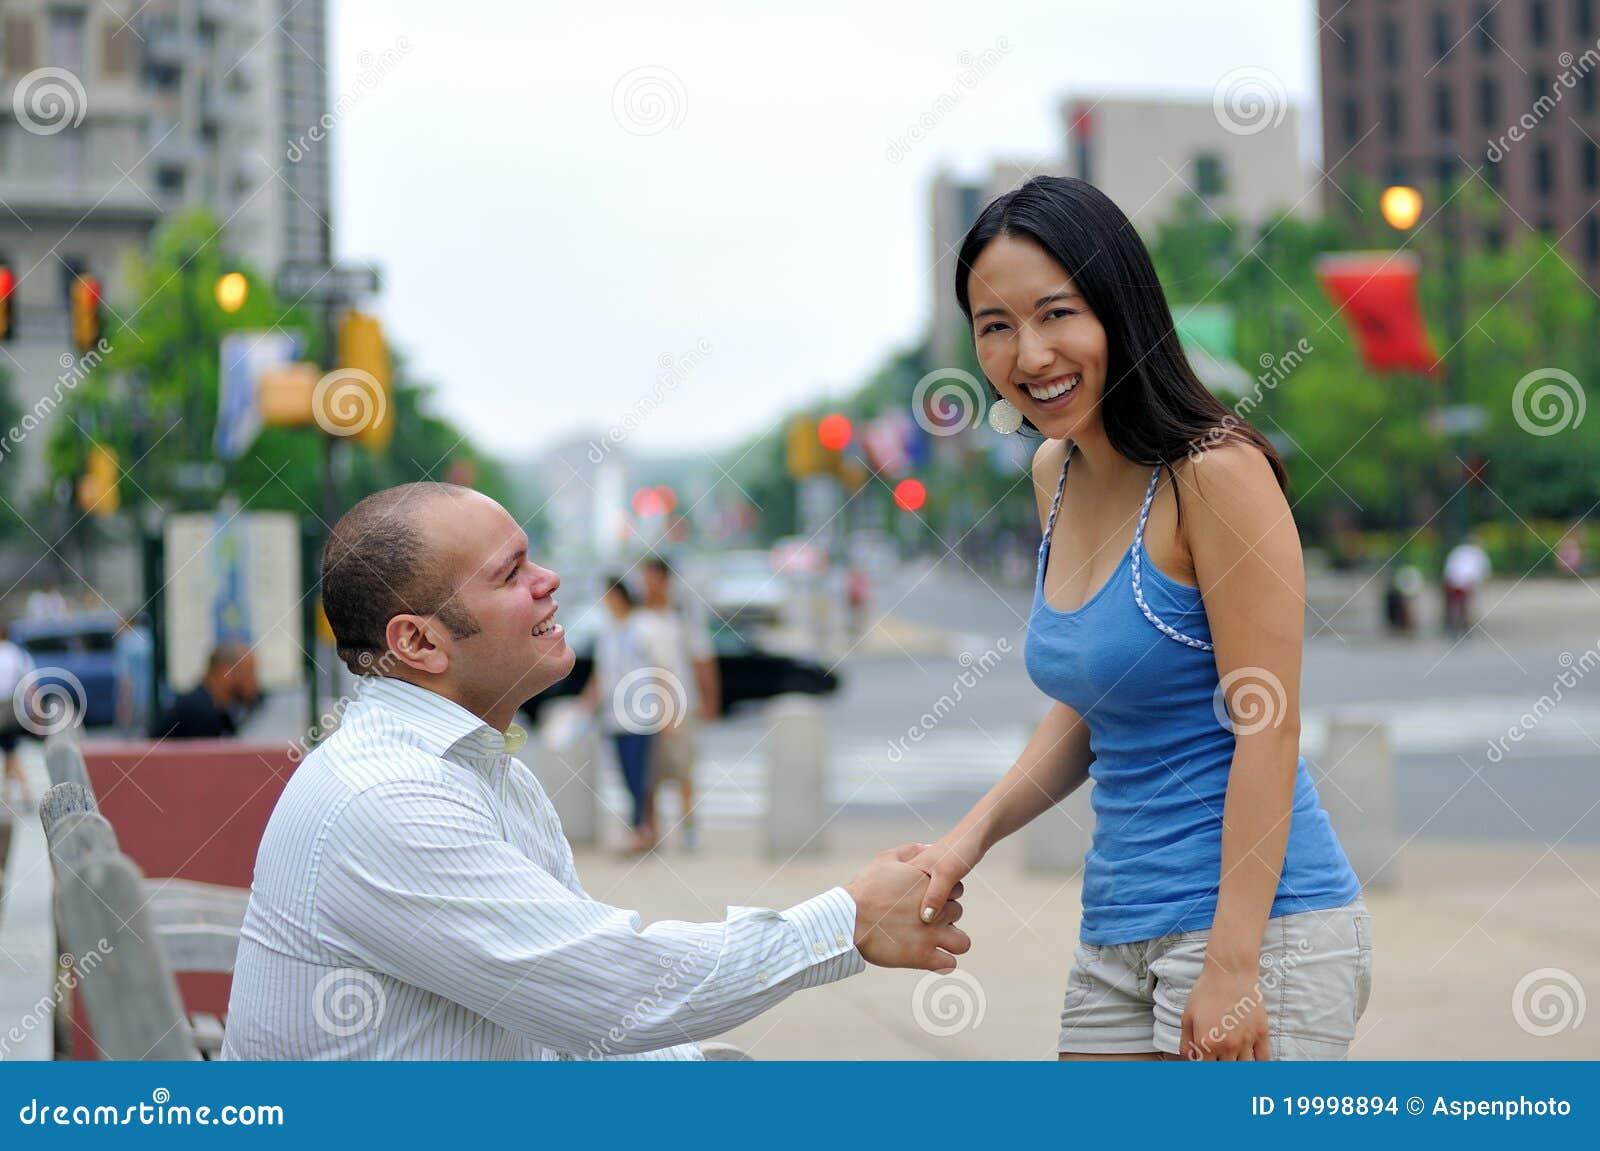 Black Ebony Teen Couple